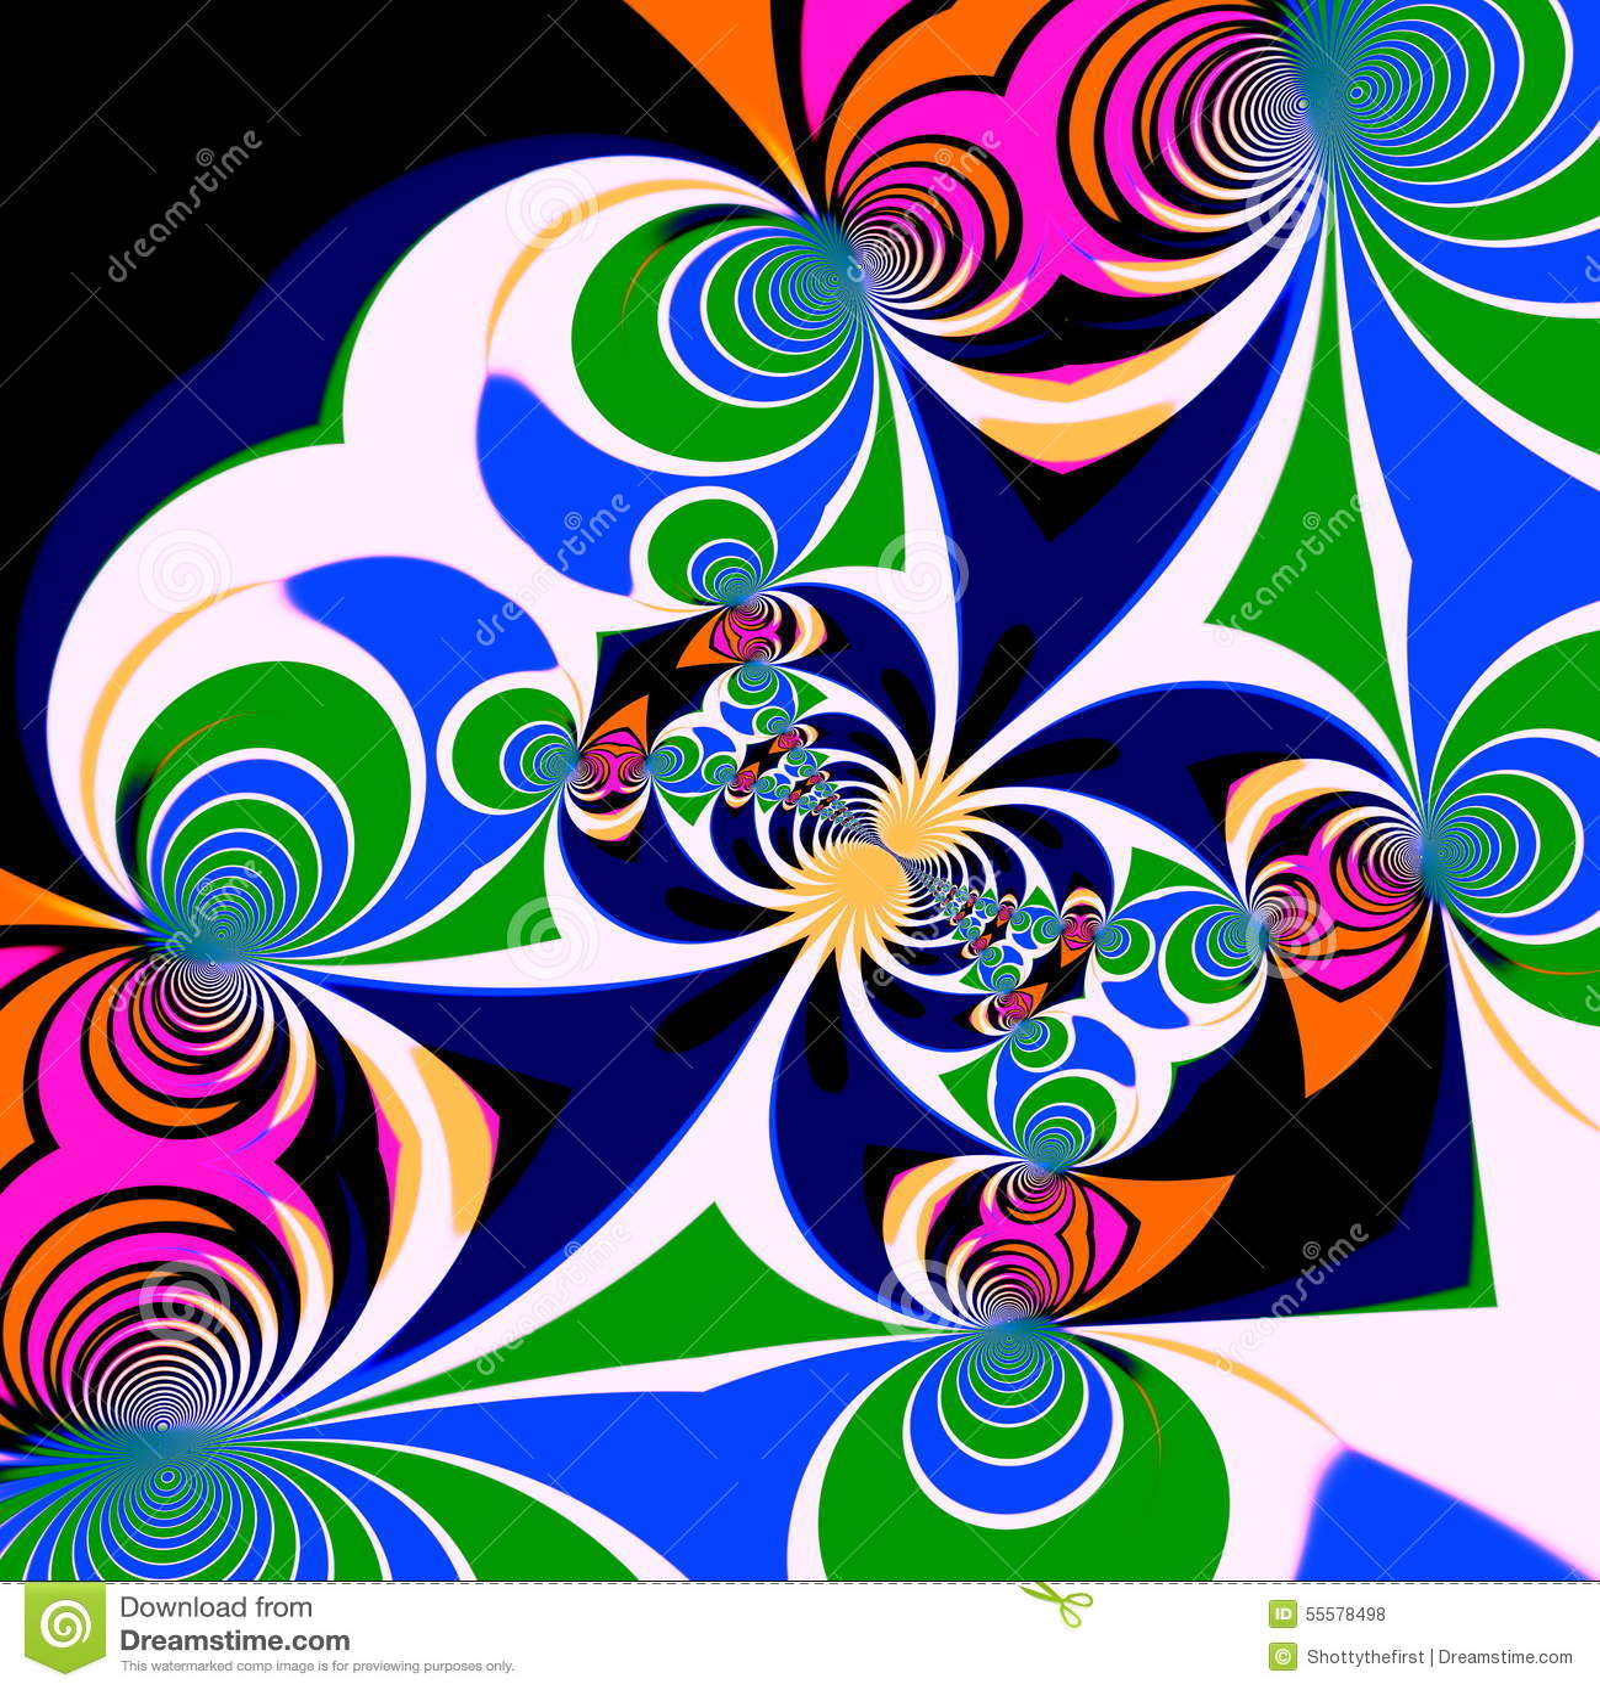 Symmetrical Designs In Art Images